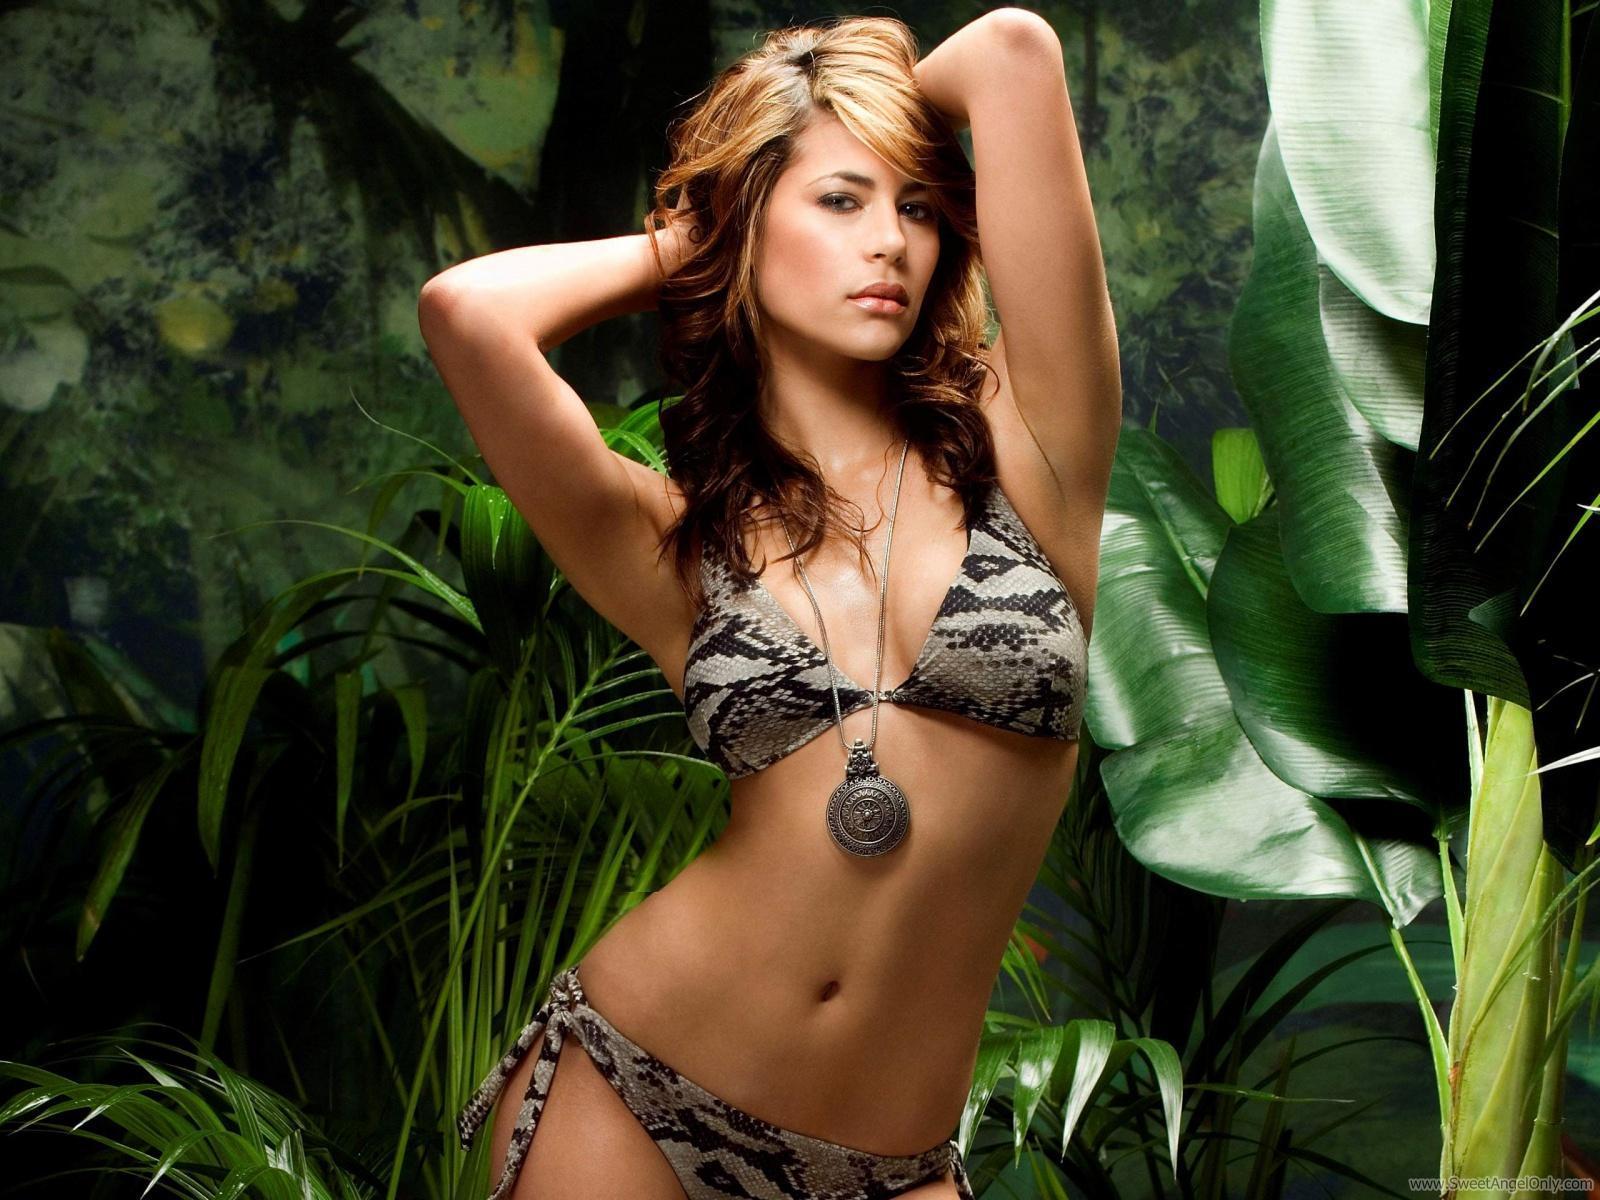 http://1.bp.blogspot.com/-QHMEcemdZqs/TsDb74DfyvI/AAAAAAAAA1g/yVztIPoCrmQ/s1600/karima_adebibe_glamor_wallpaper-1600x1200.jpg